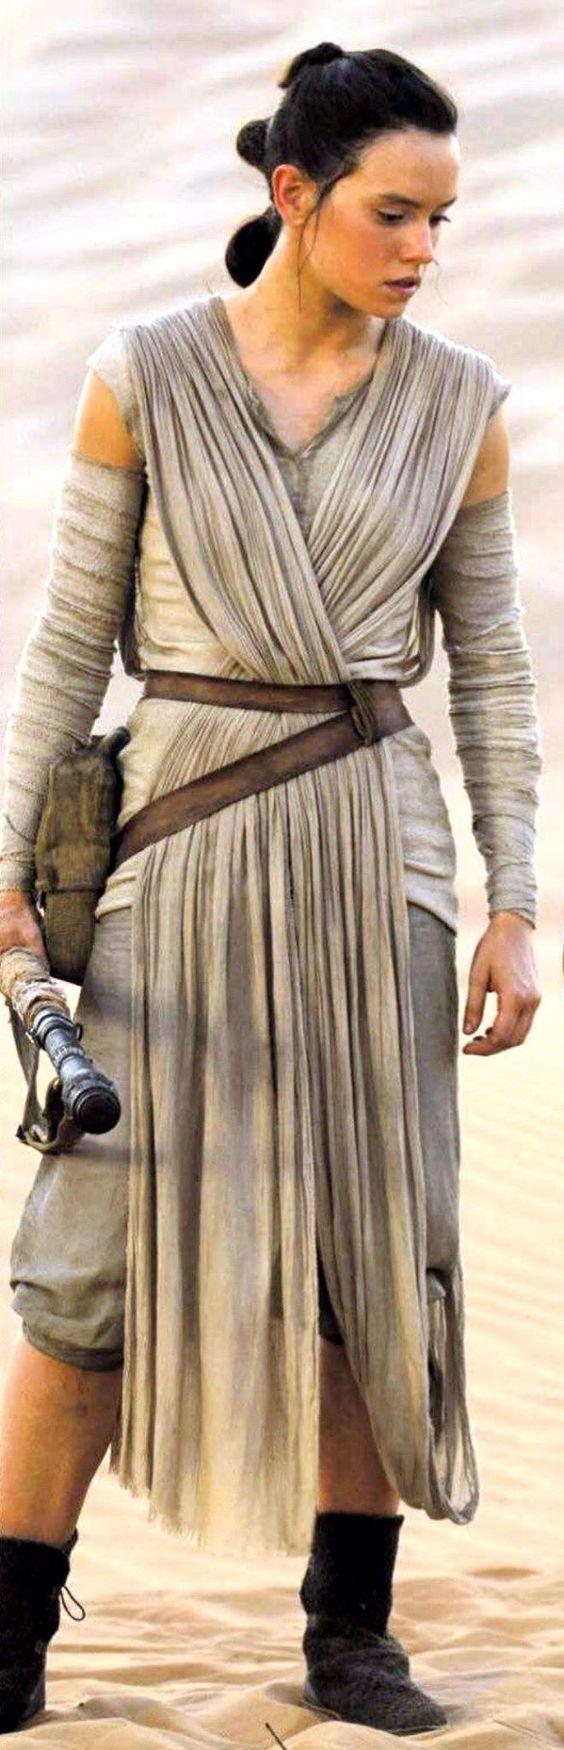 Star Wars Kostüm selber machen | Kostüm-Idee zu Karneval, Halloween & Fasching